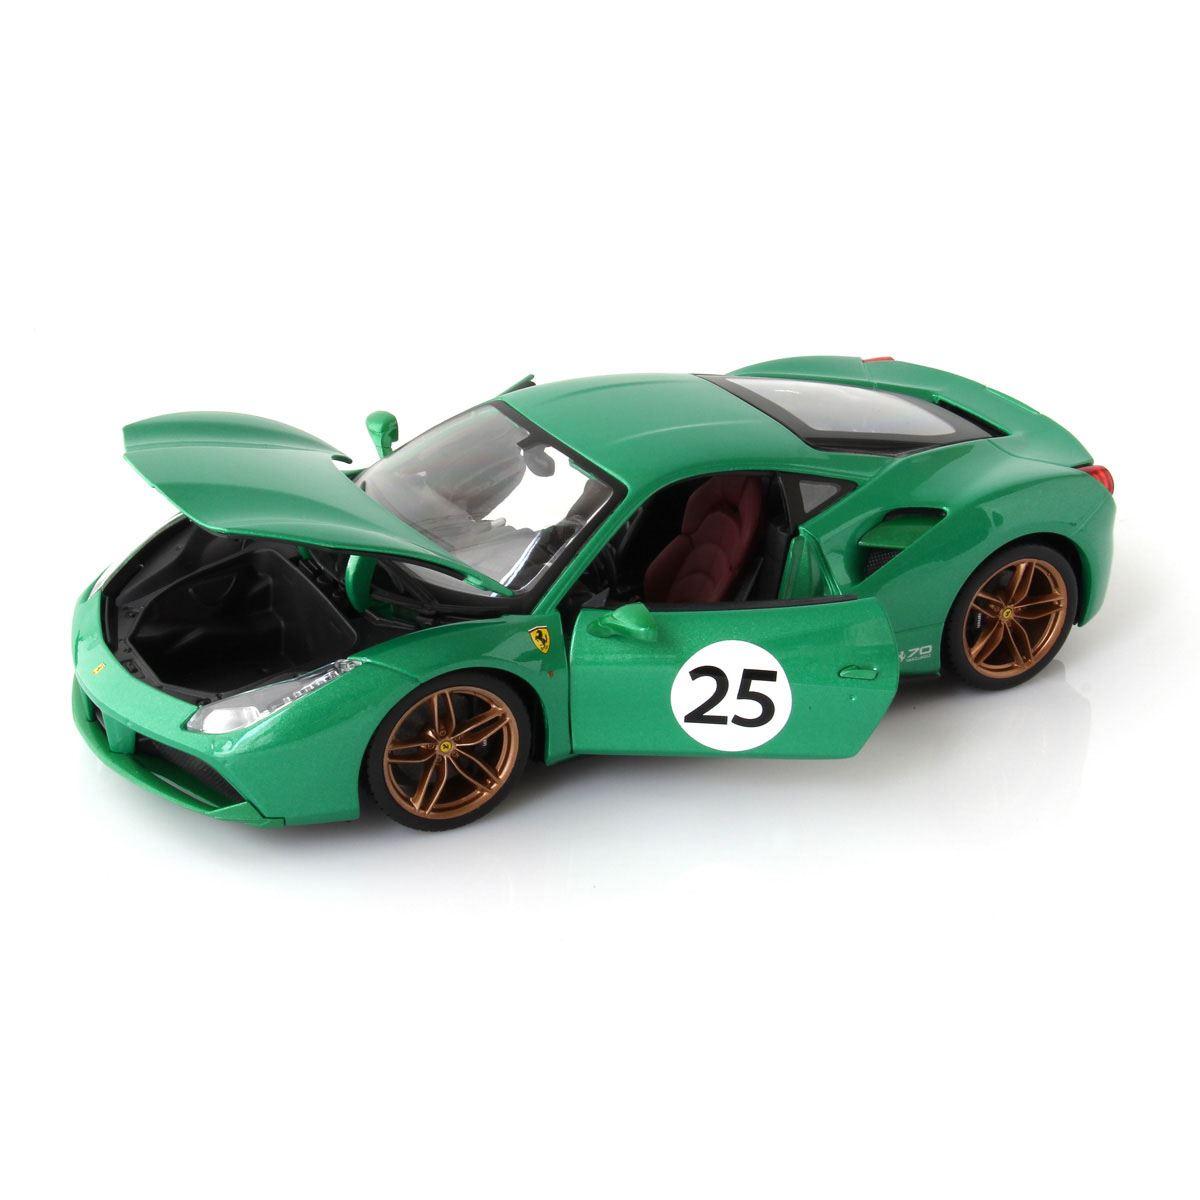 Gbt The Green Jewel No 37